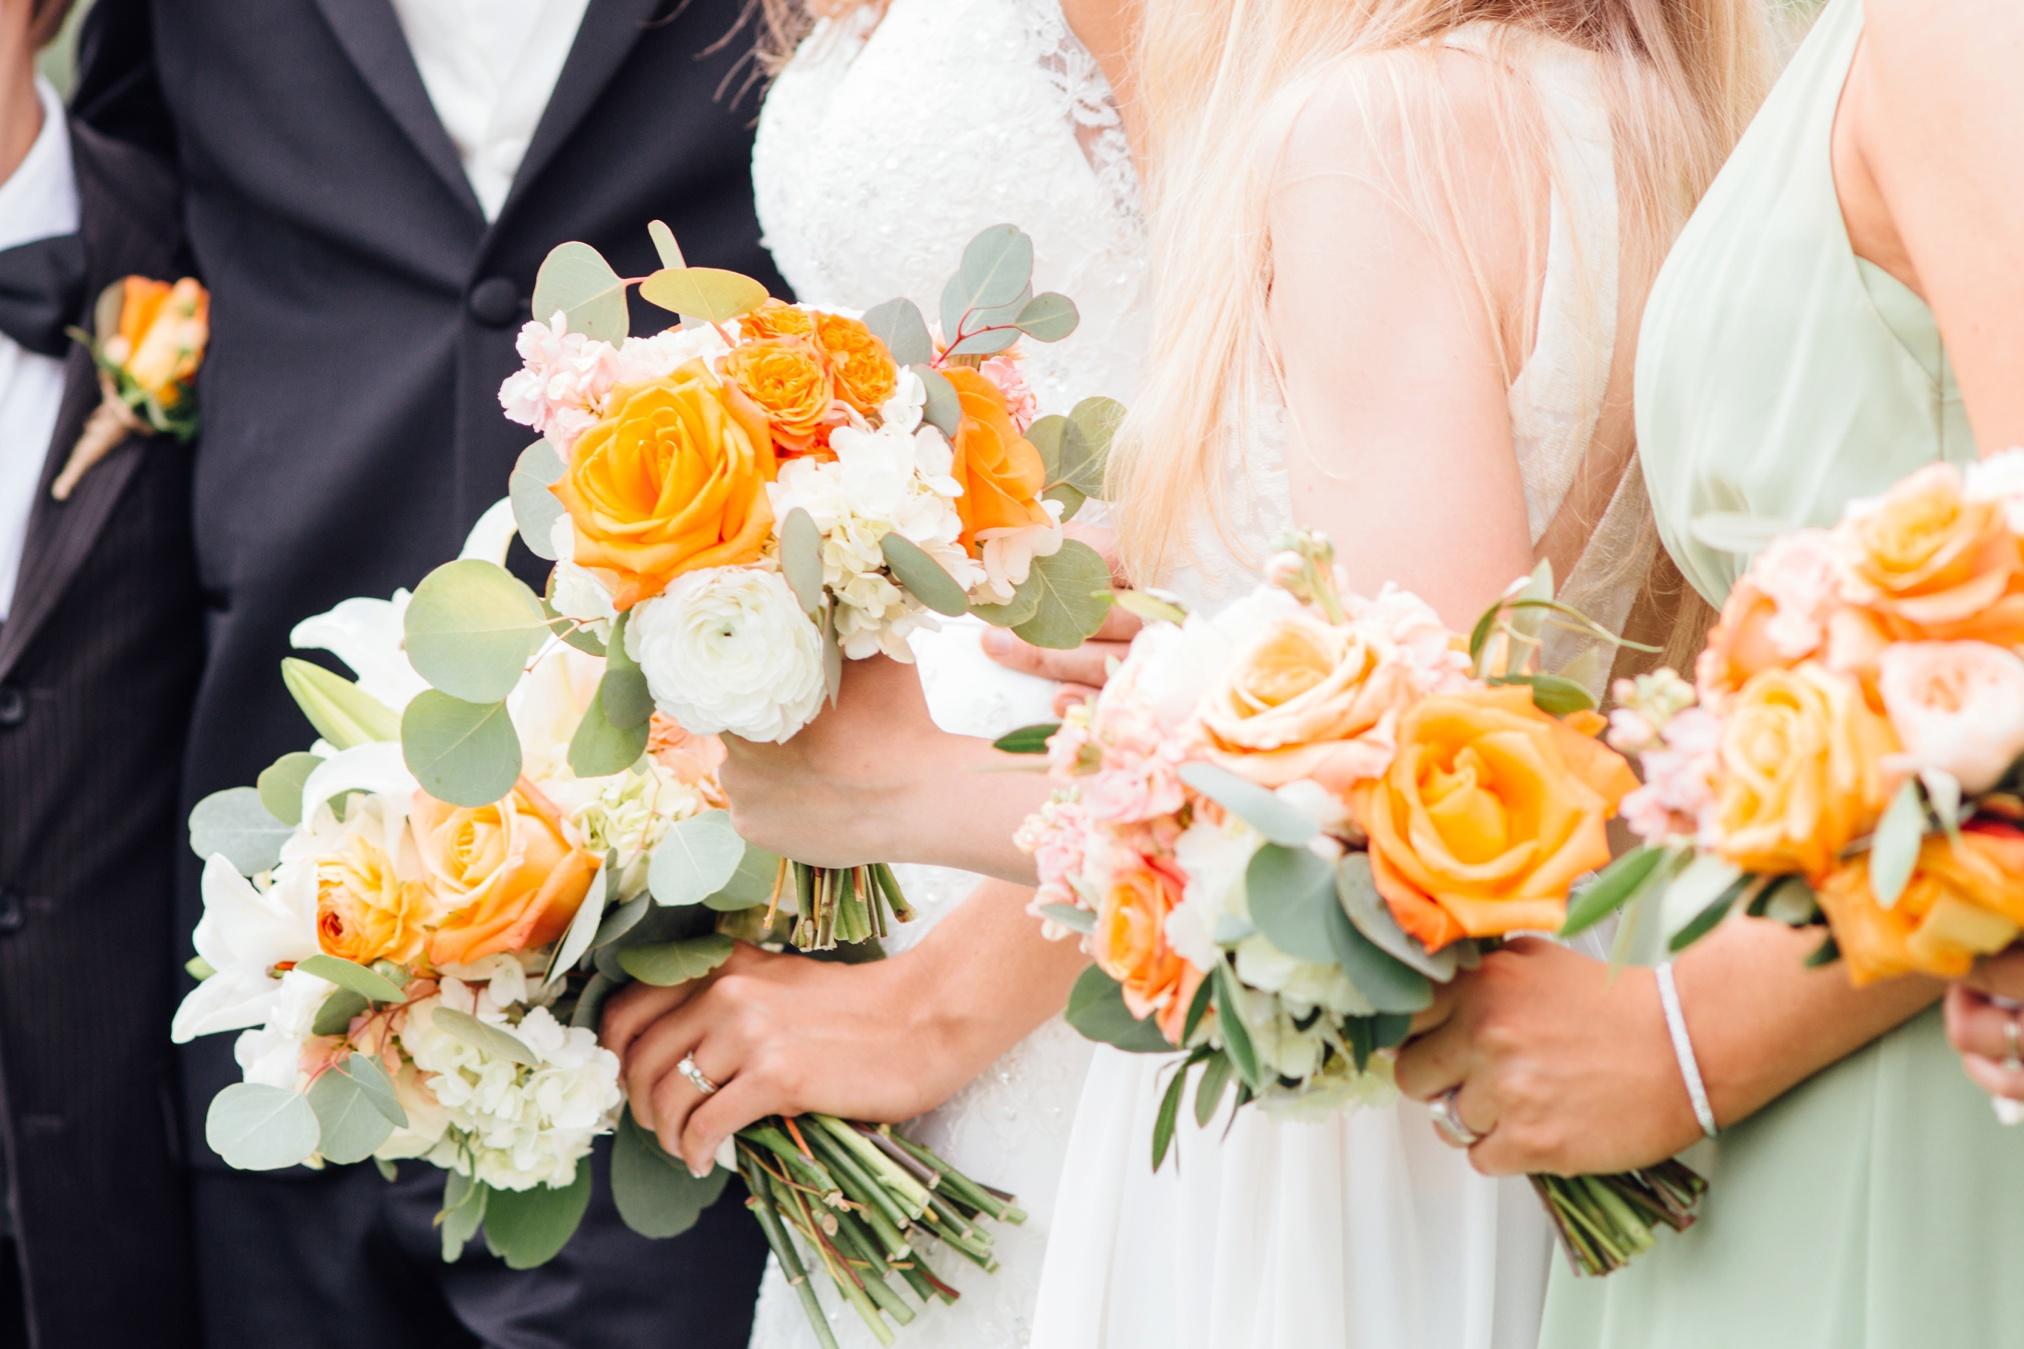 schmid_wedding-615.jpg